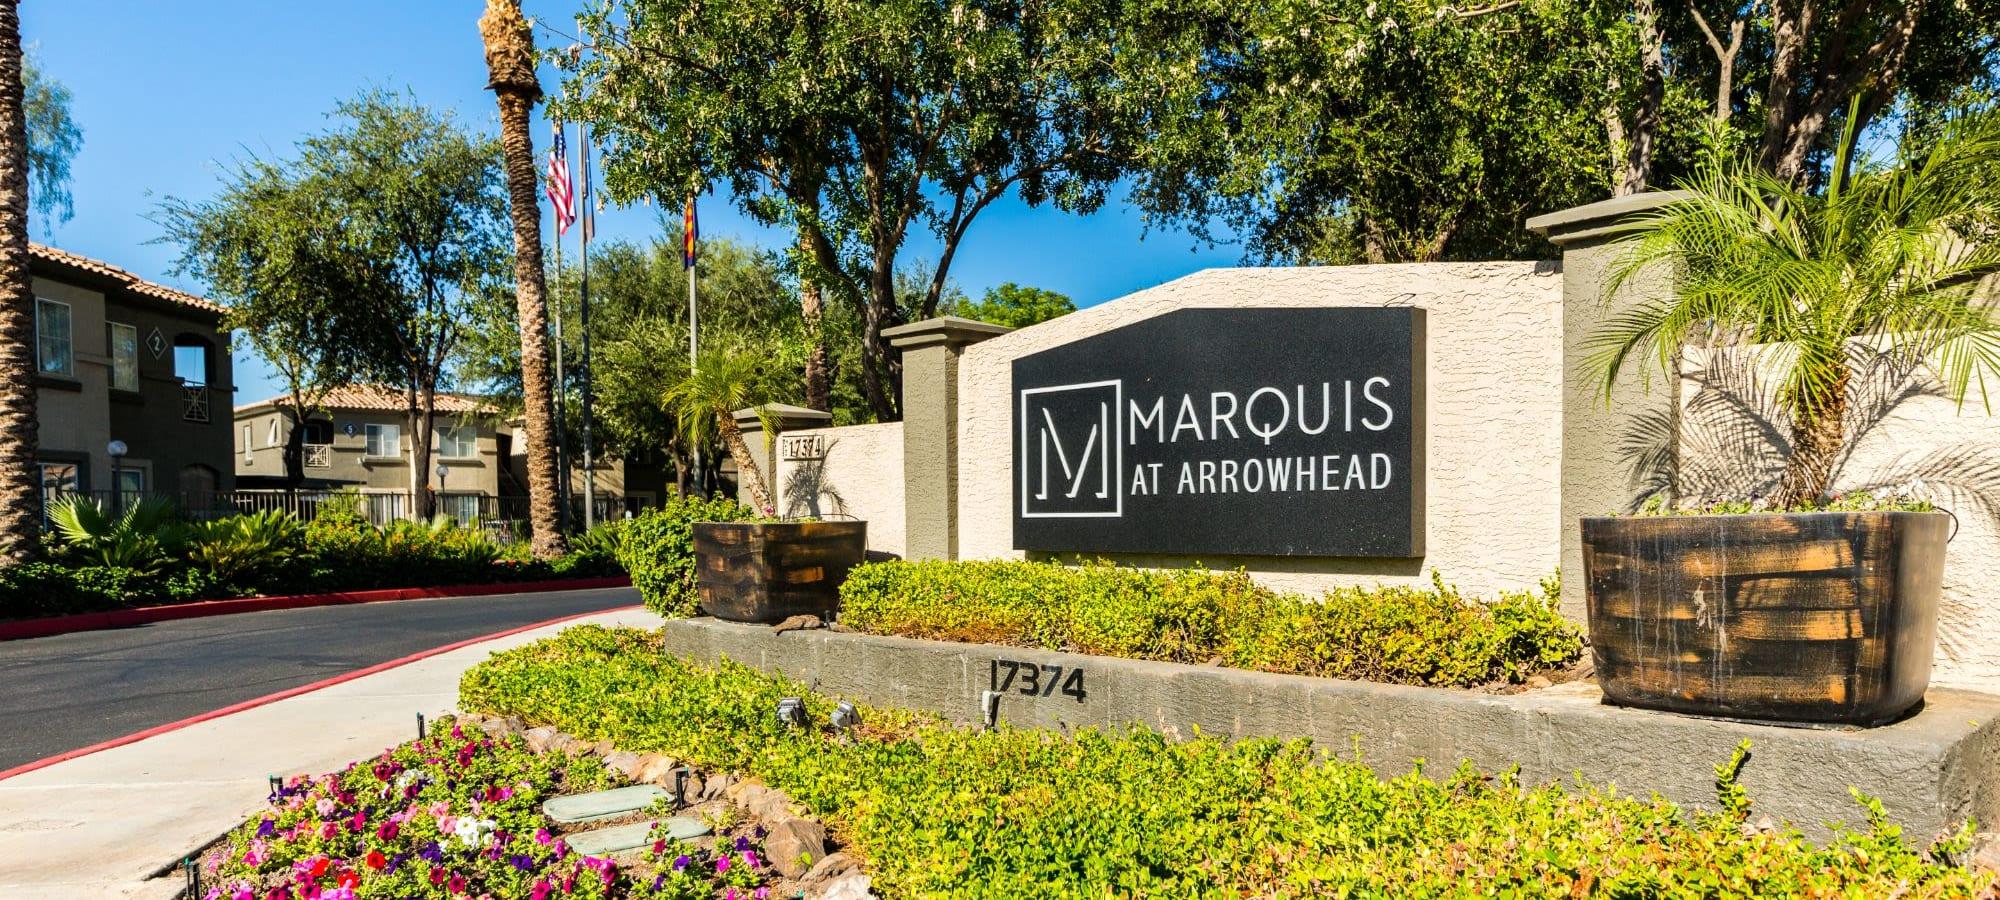 Virtual tours of Marquis at Arrowhead in Peoria, Arizona